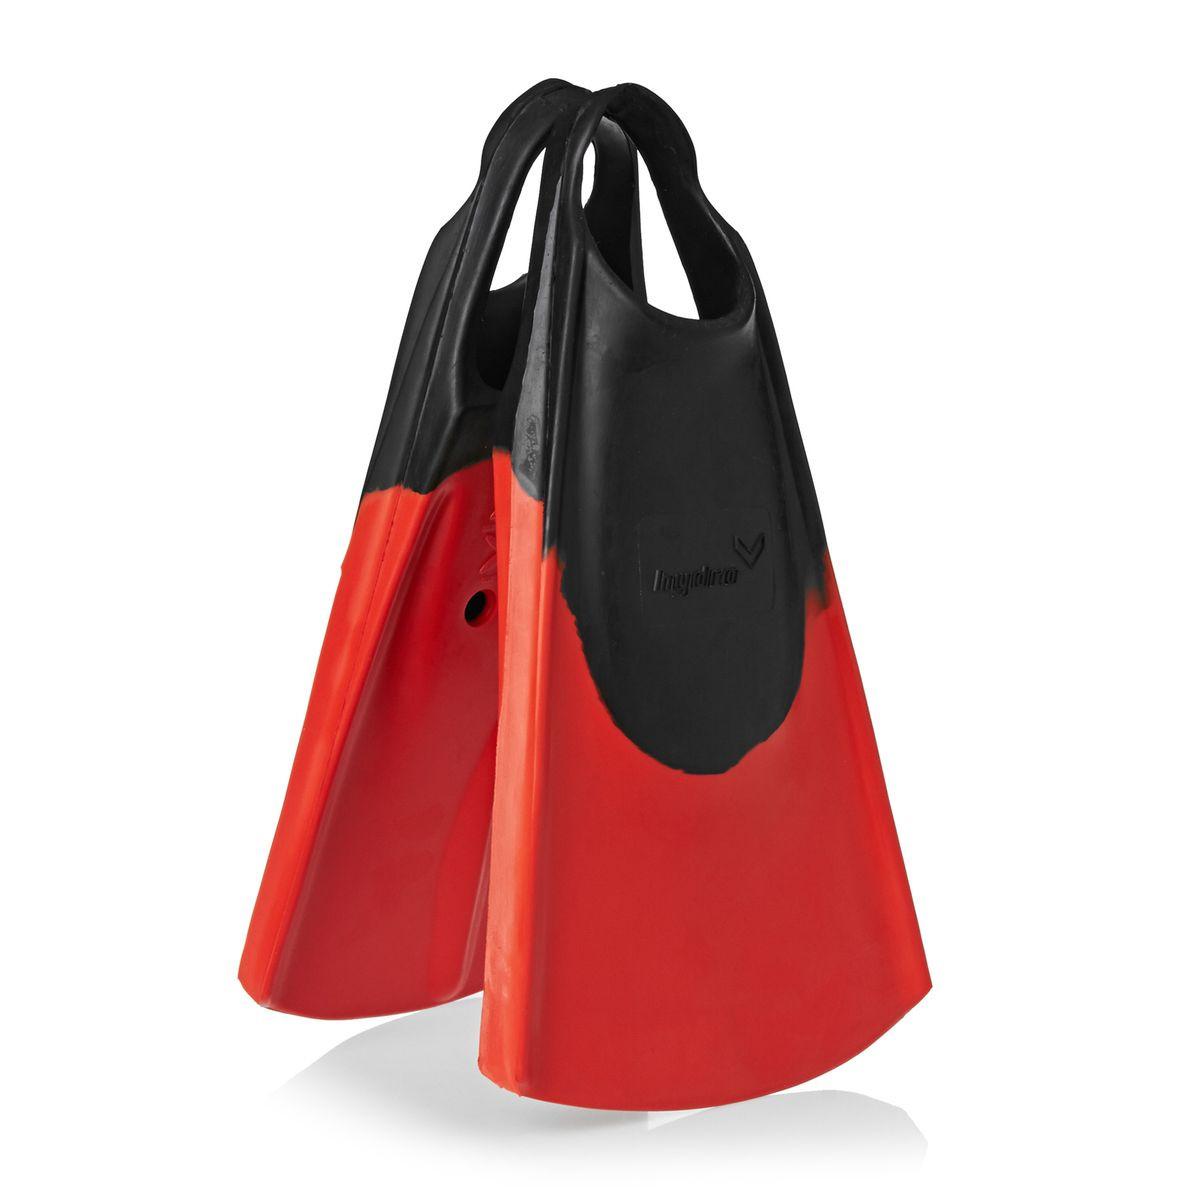 Hydro Original Bodyboard Fins - Black/ Red